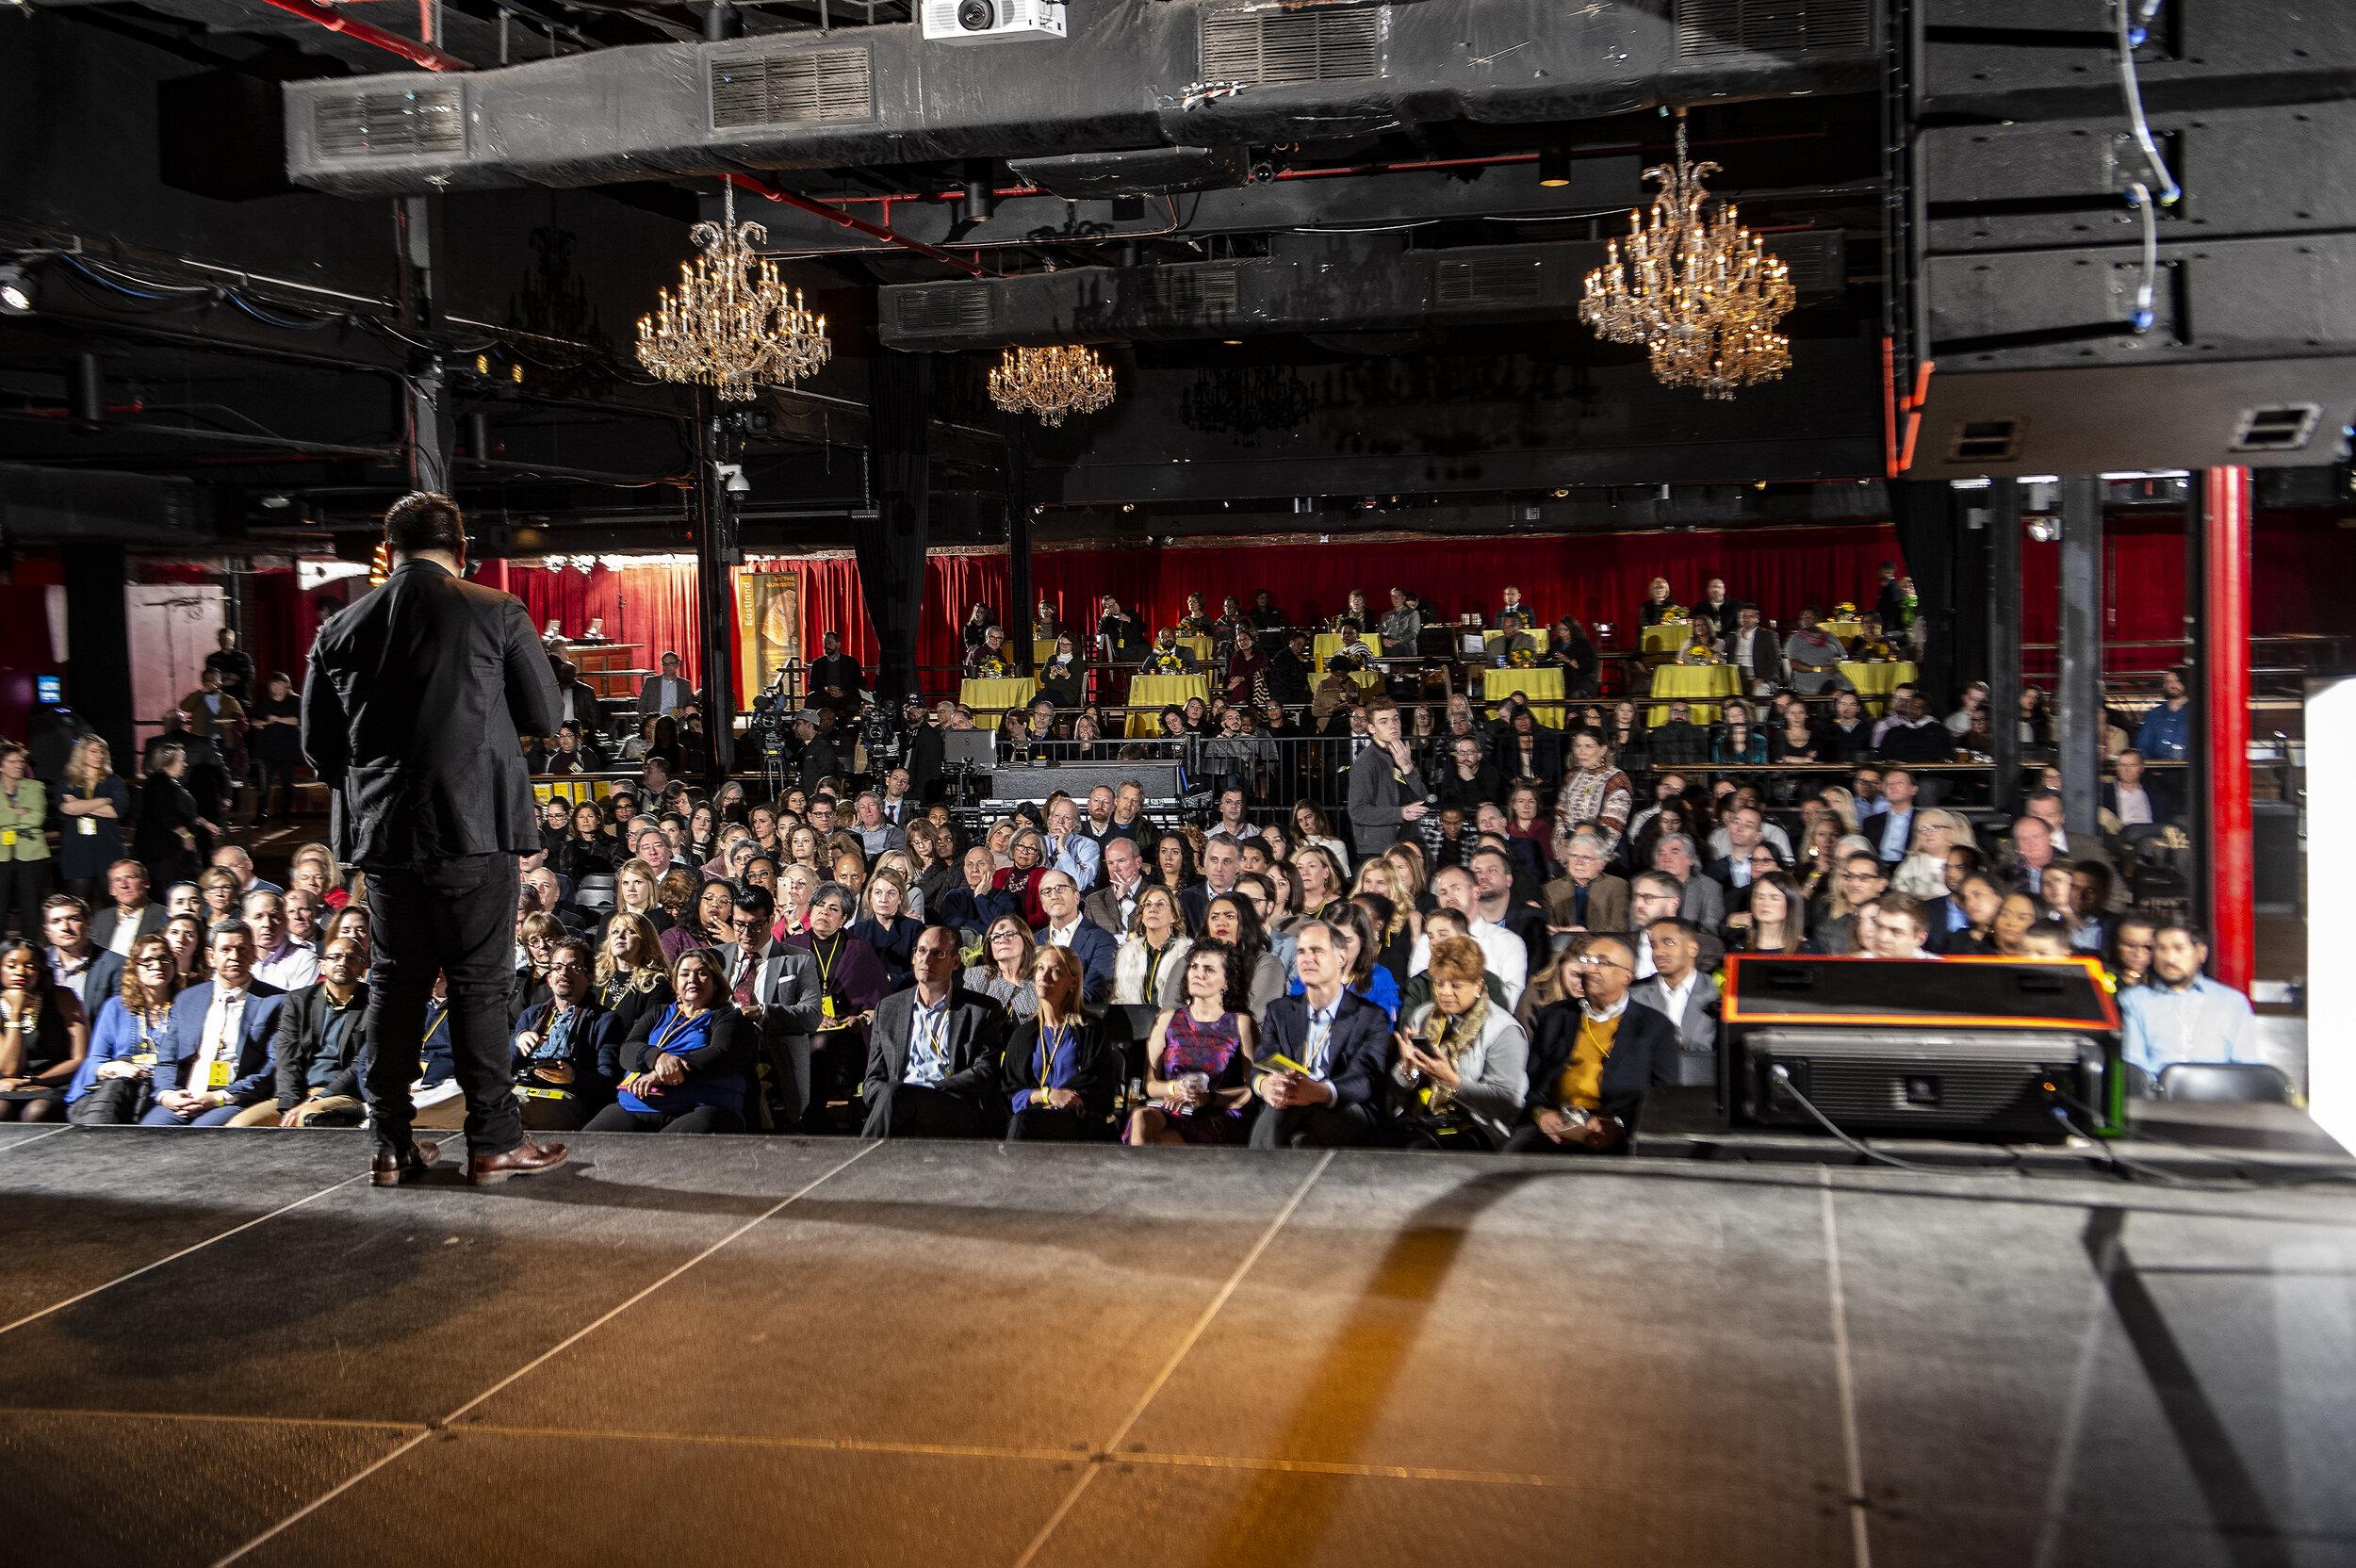 Taste of the New South Presents Jose Antonio Vargas @ The Fillmore 3-6-19 by Jon Strayhorn 110.jpg